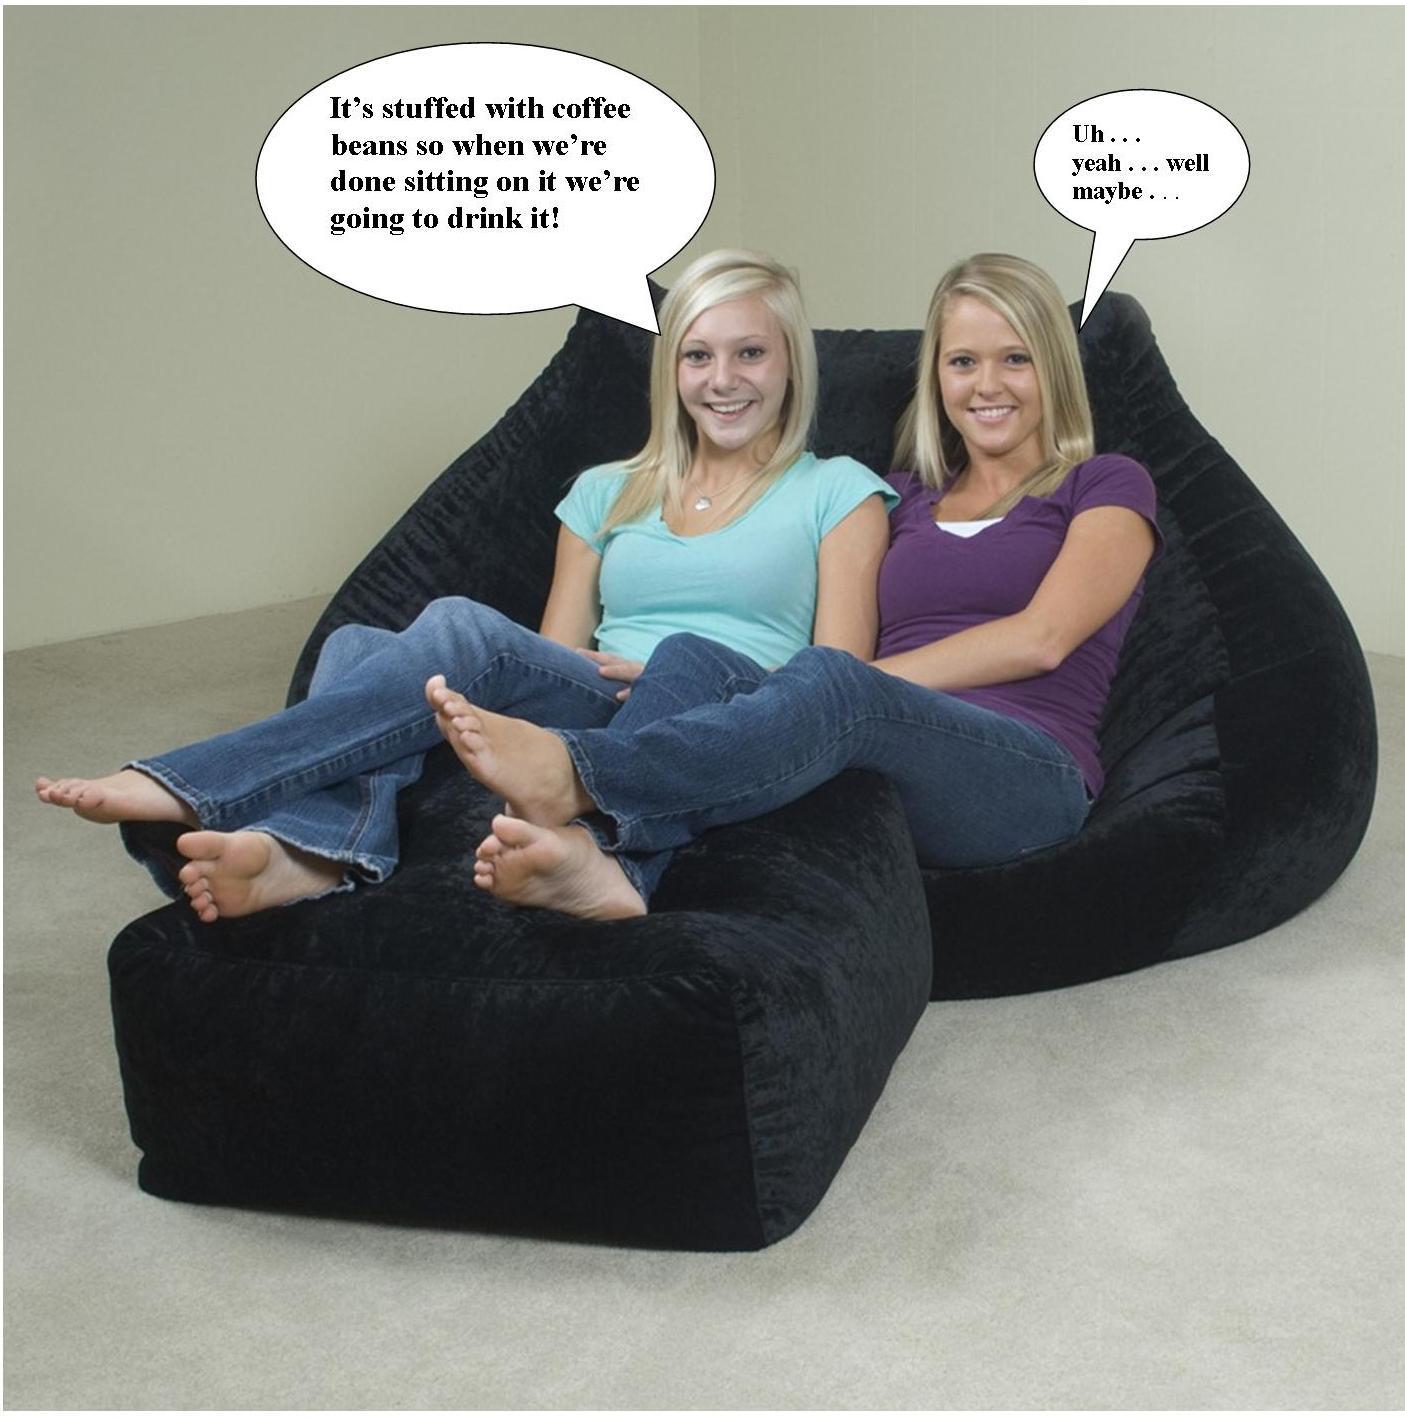 Coffee Bean Bag Chairs Linda Vernon Humor